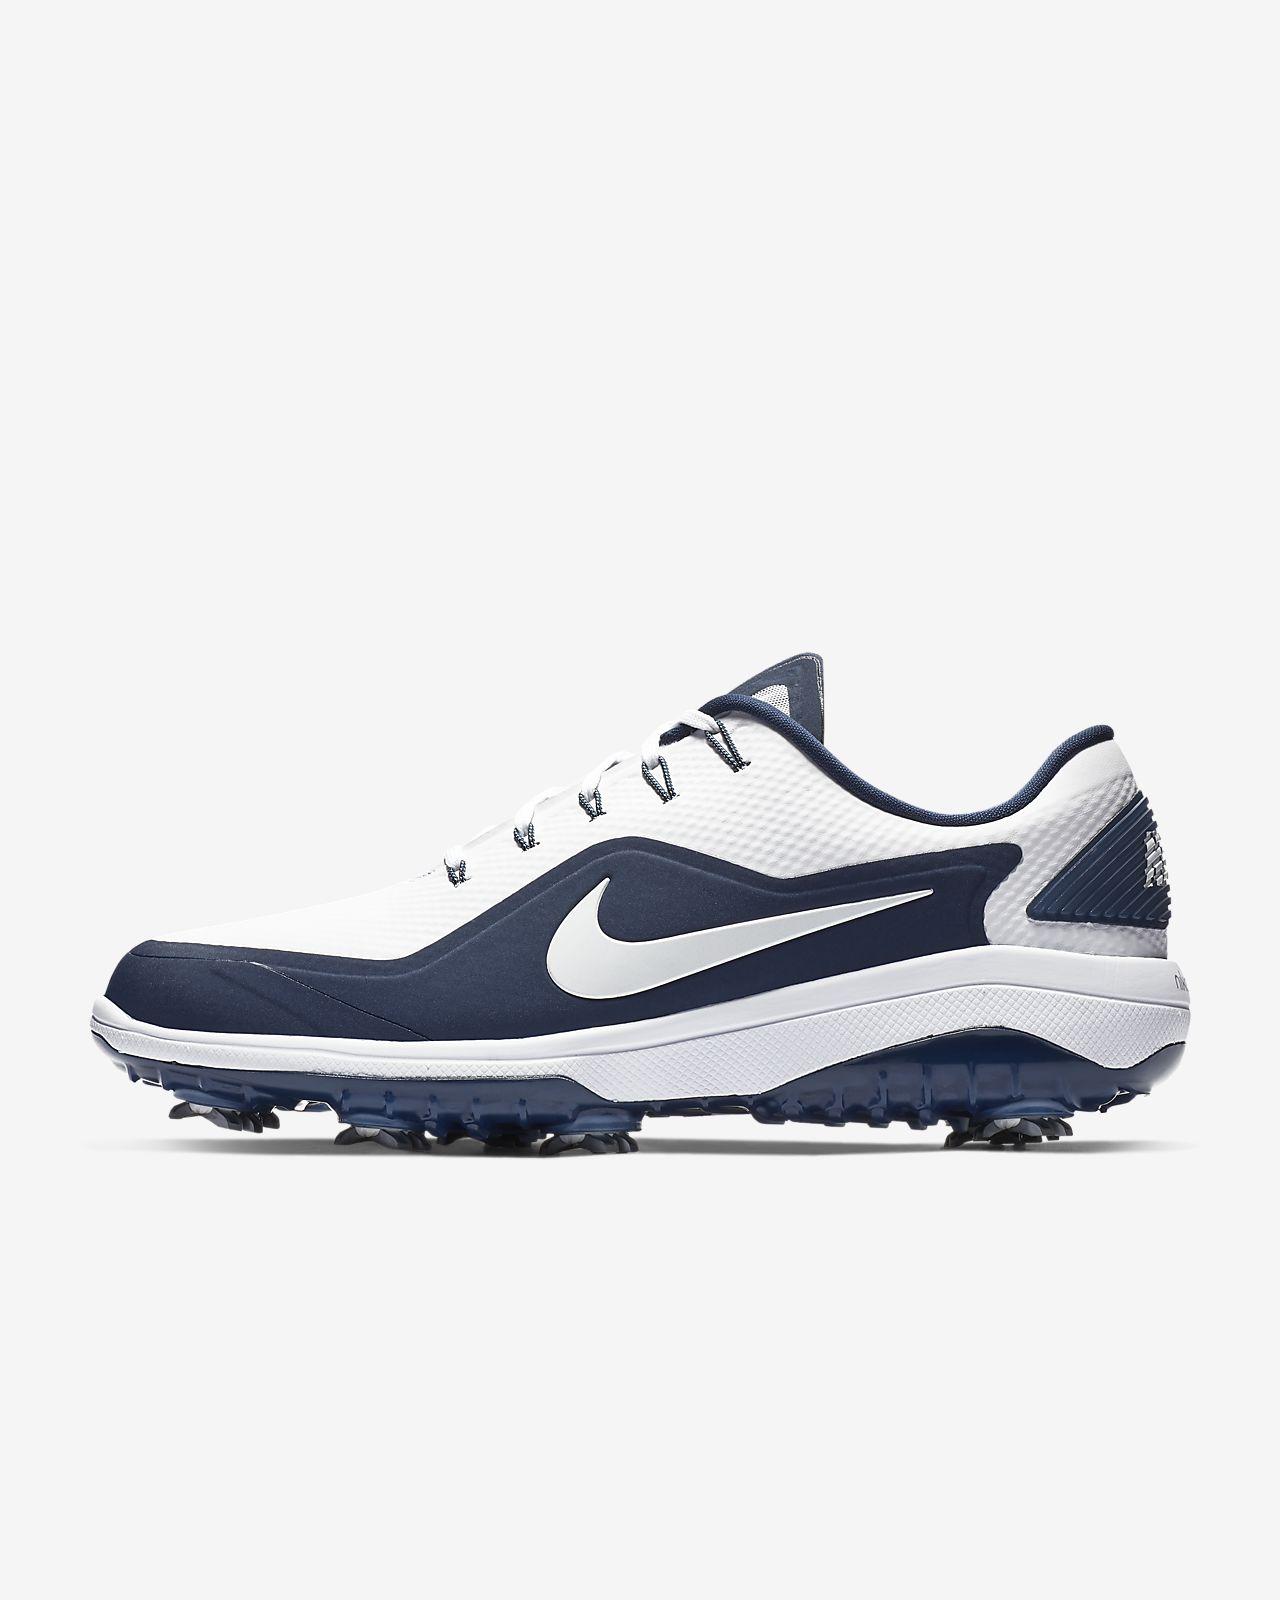 50f86a484391 Nike React Vapor 2 Men s Golf Shoe. Nike.com AT